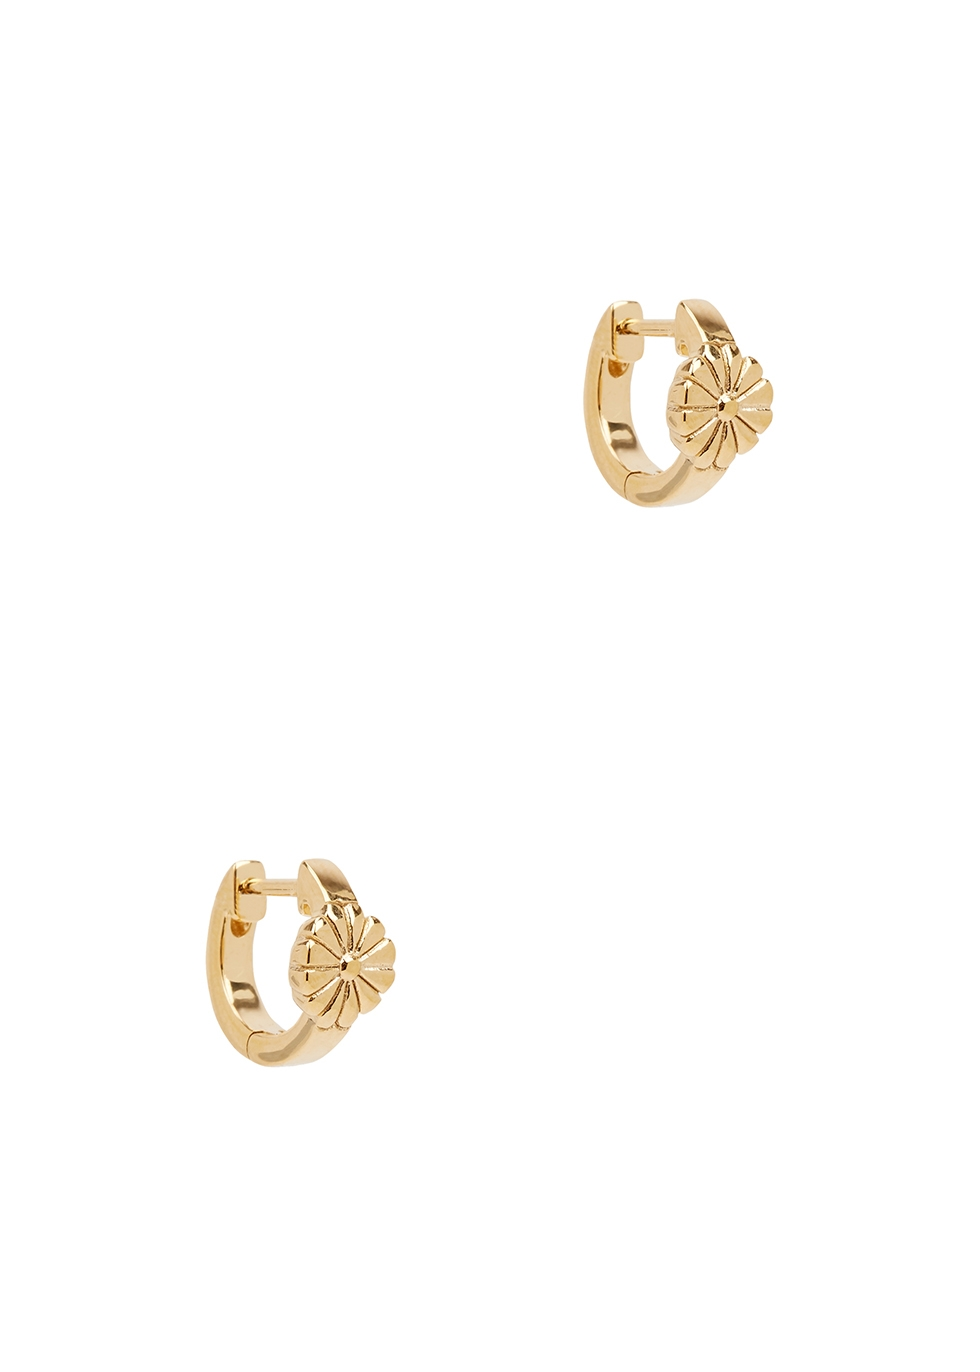 Daisy 18kt gold-plated hoop earrings